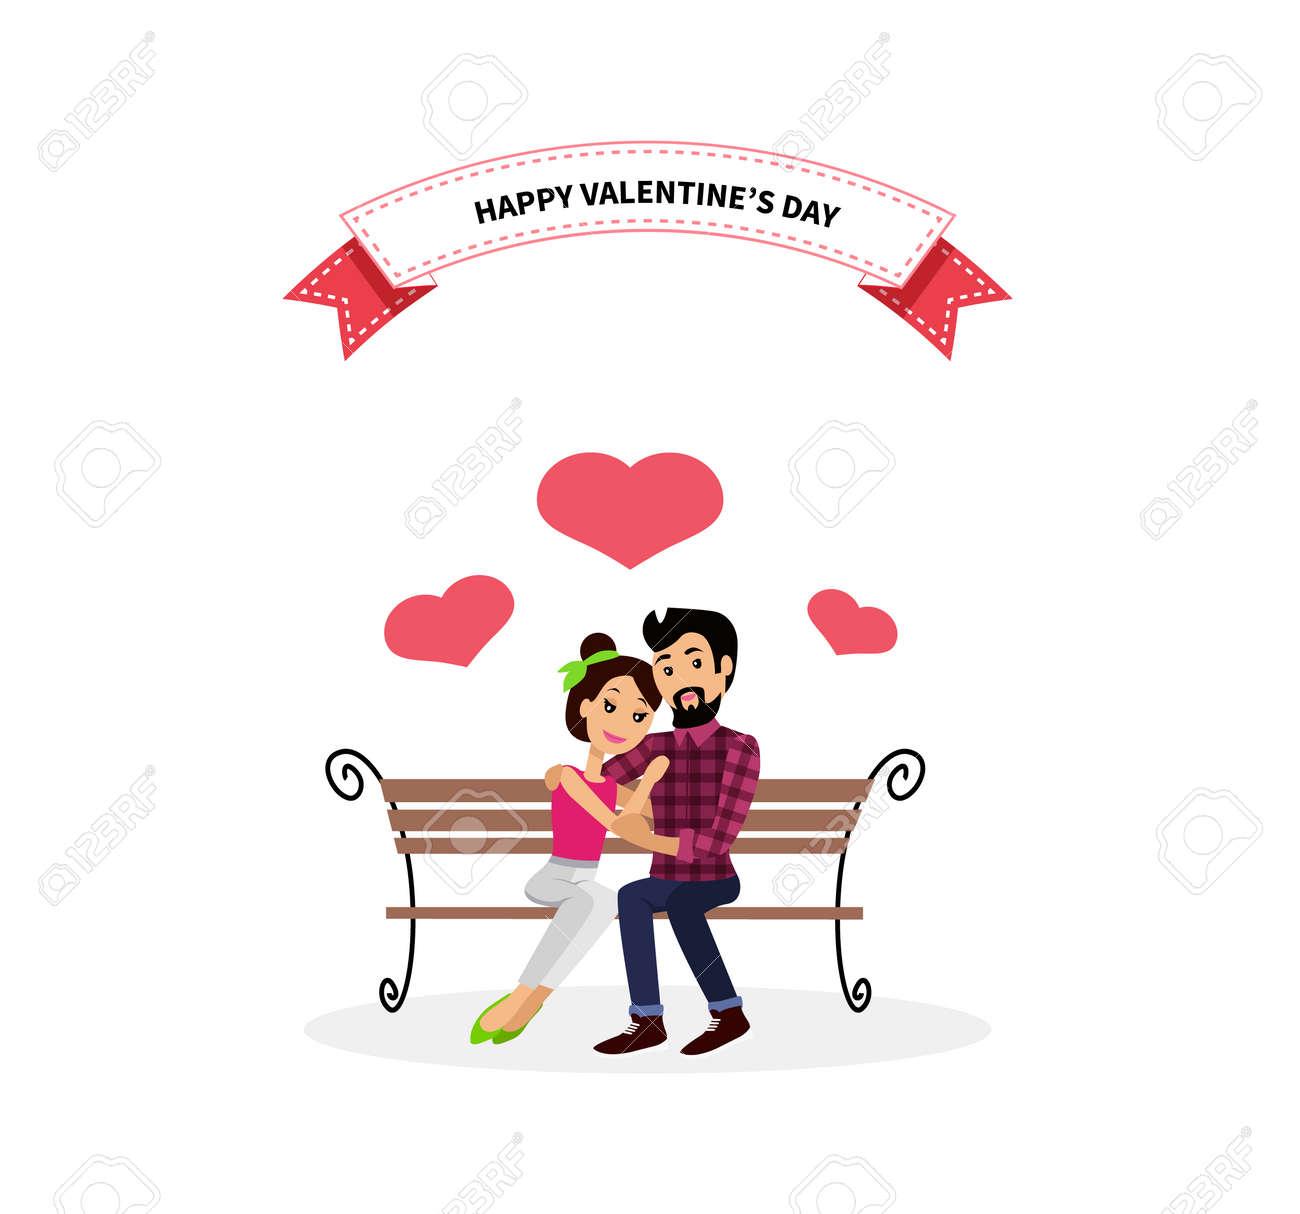 Happy valentine day couple sitting on bench. Happy valentine, couple love, young couple, happy couple, woman hug man, couple happy, lover celebration valentine day, romantic relationship illustration - 51856499